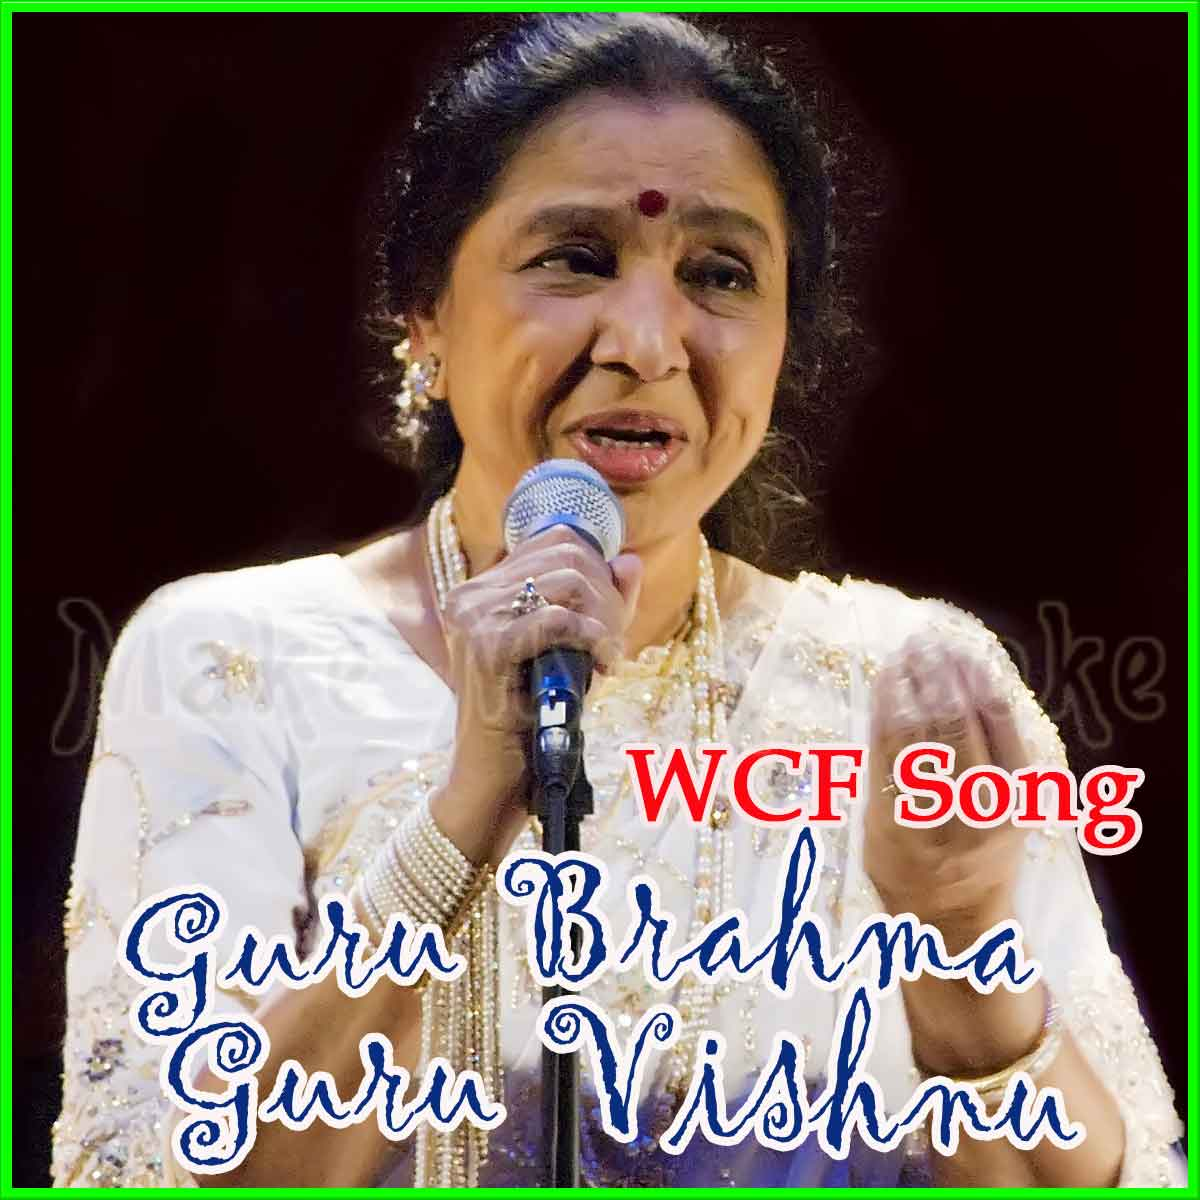 Guru Brahma Guru Vishnu Guru Devo Maheshwara - Guru Brahma Guru Vishnu (MP3  And Video-Karaoke Format)